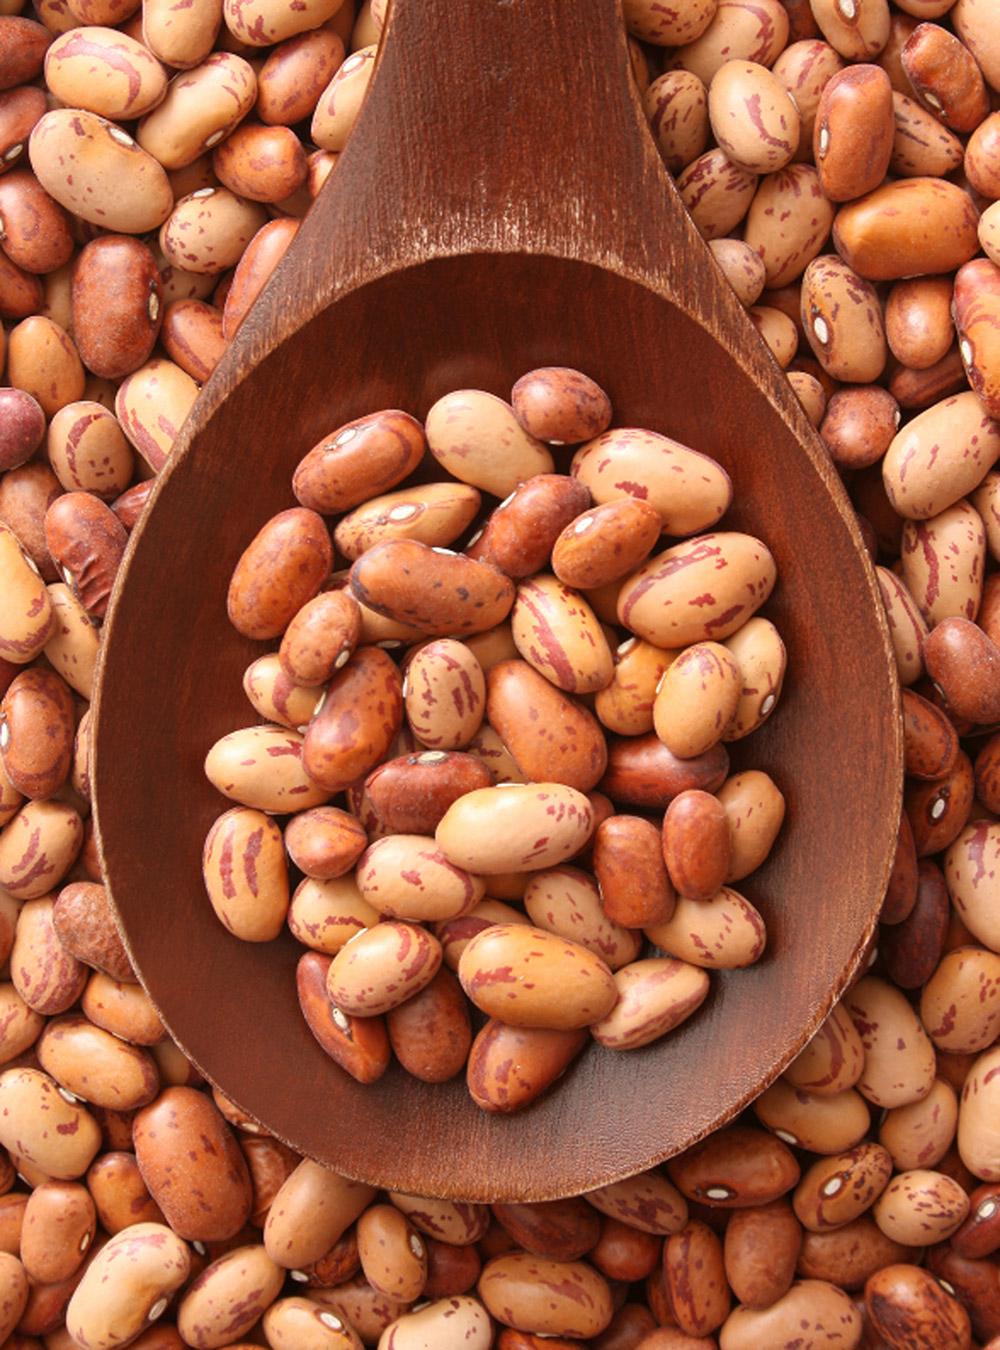 Chili express aux haricots pinto | ricardo